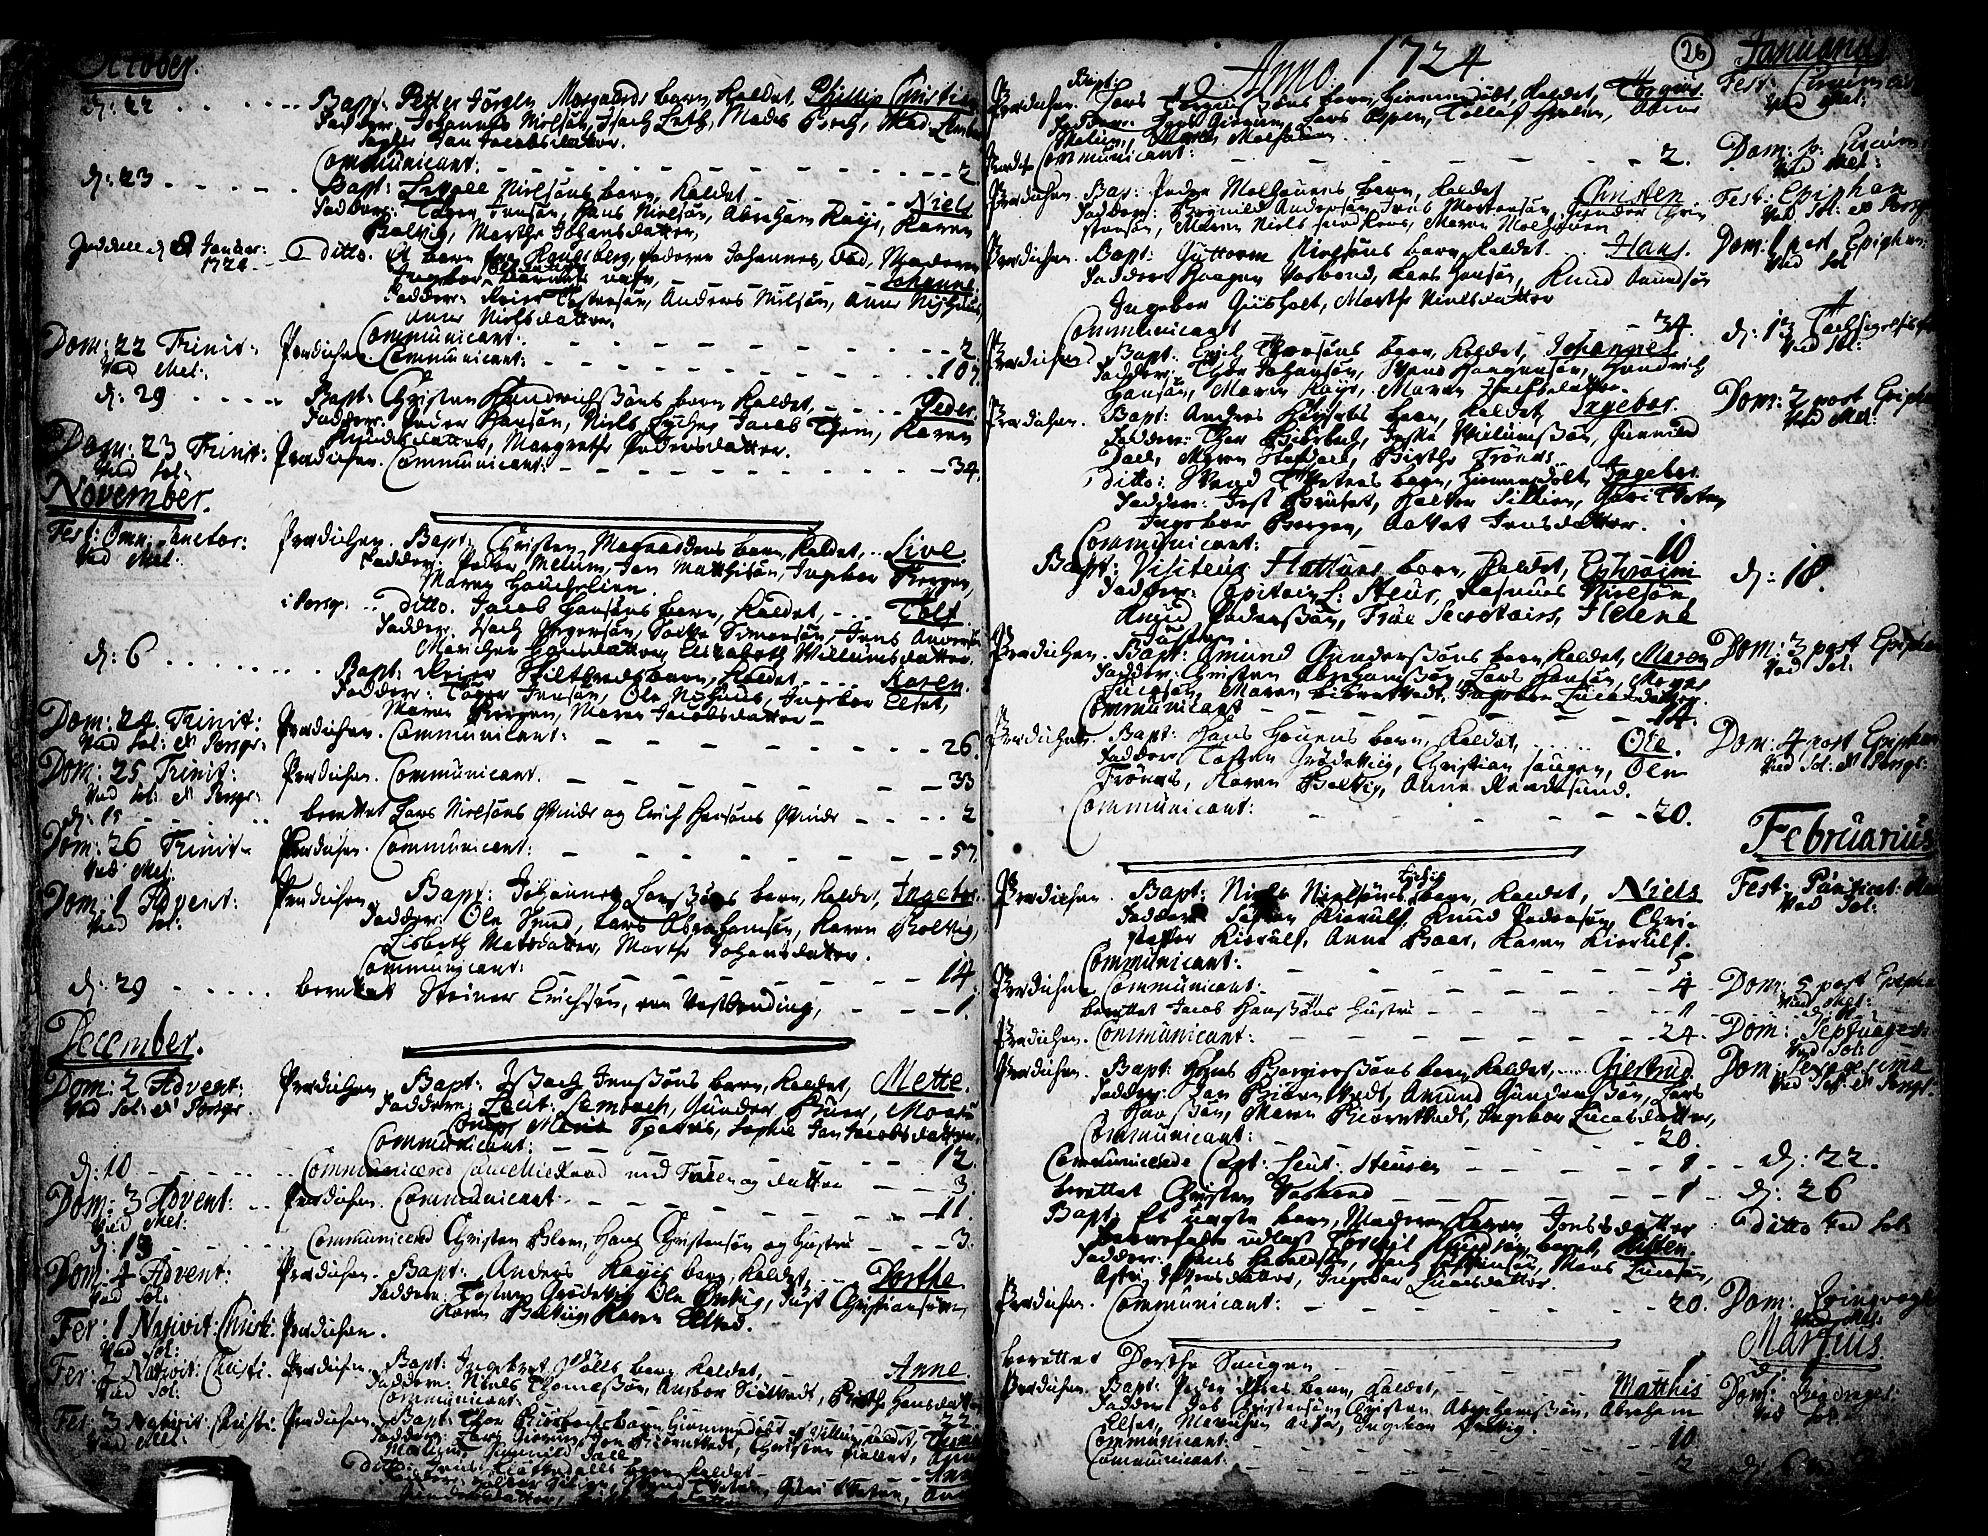 SAKO, Solum kirkebøker, F/Fa/L0002: Ministerialbok nr. I 2, 1713-1761, s. 26